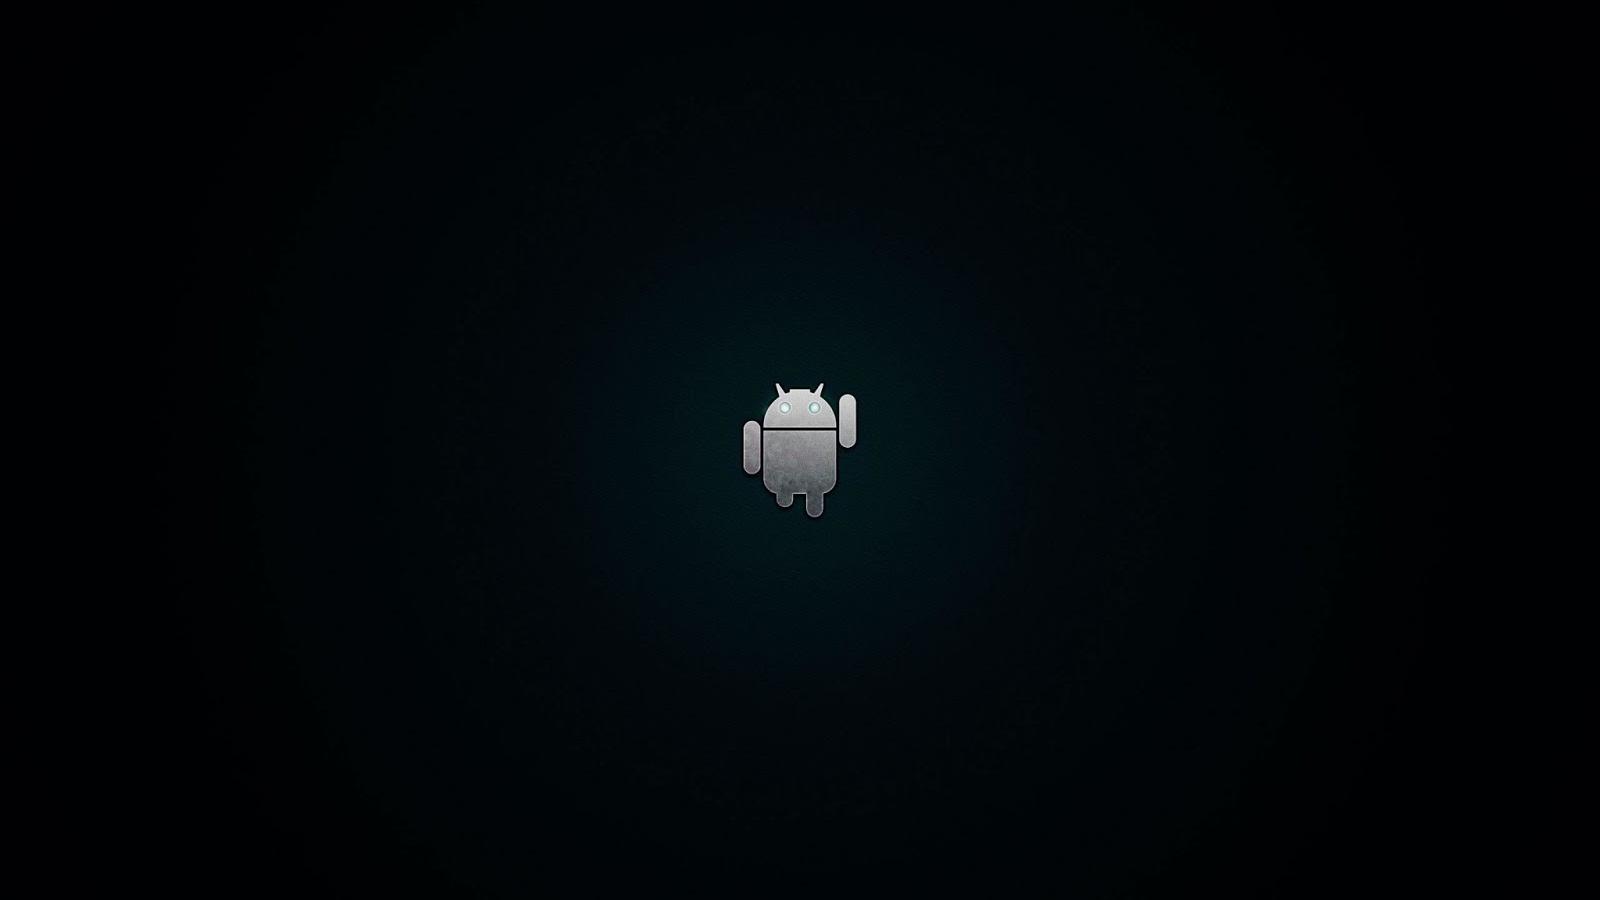 Free Black Wallpaper Android All Black Wallpaper